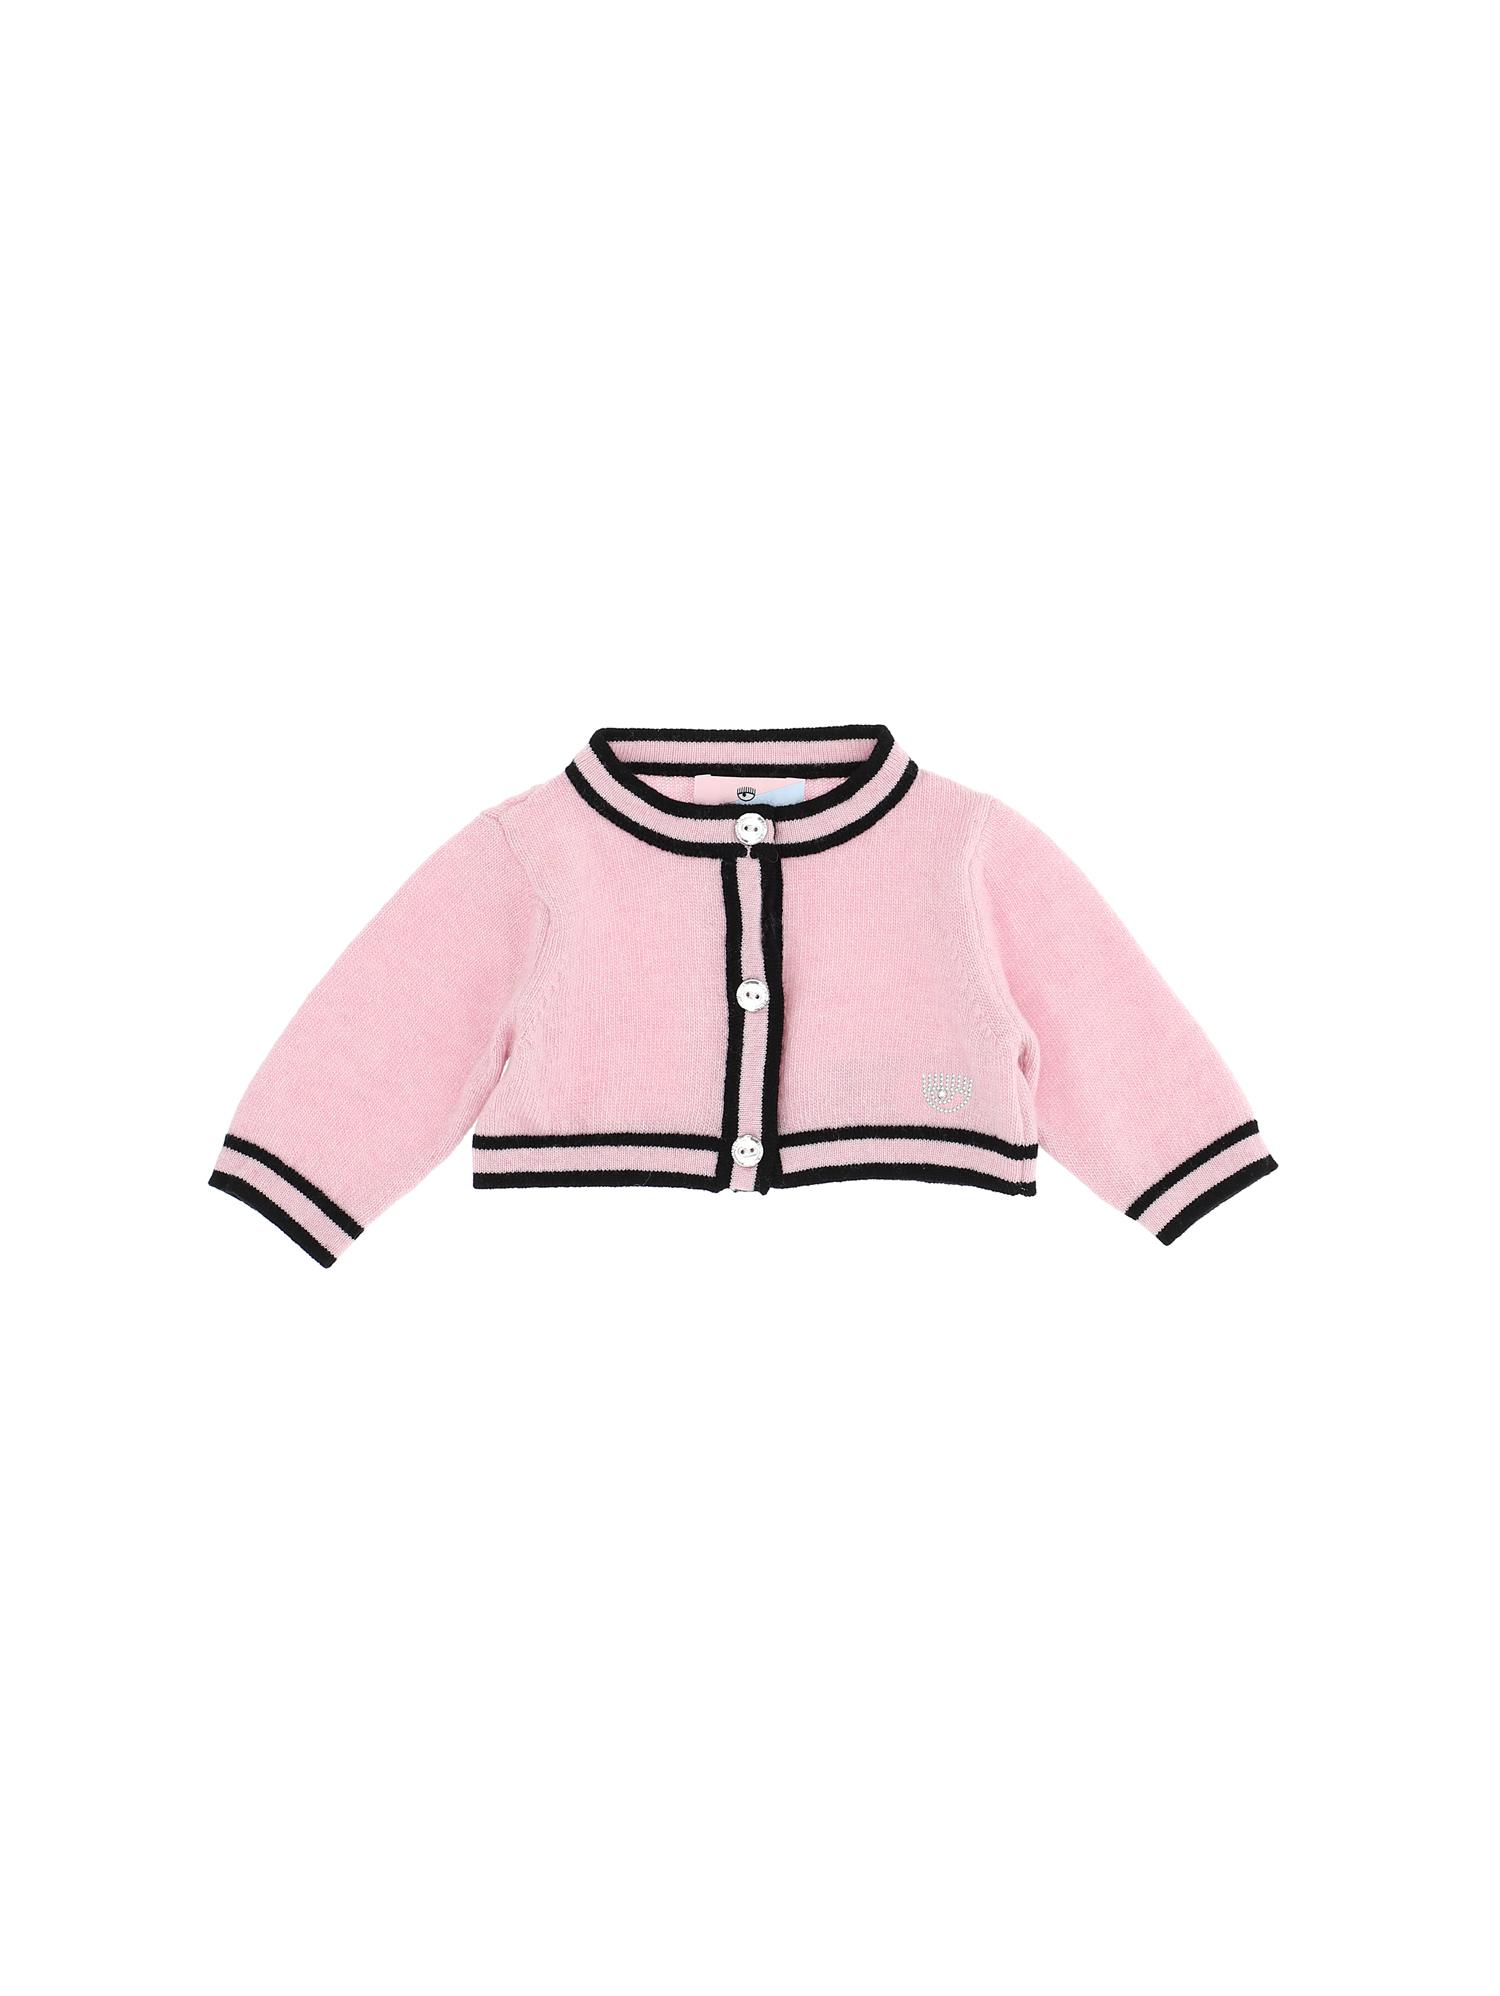 Cardigan rosa e nero Chiara Ferragni kids CHIARA FERRAGNI KIDS | 39 | 55880180659050